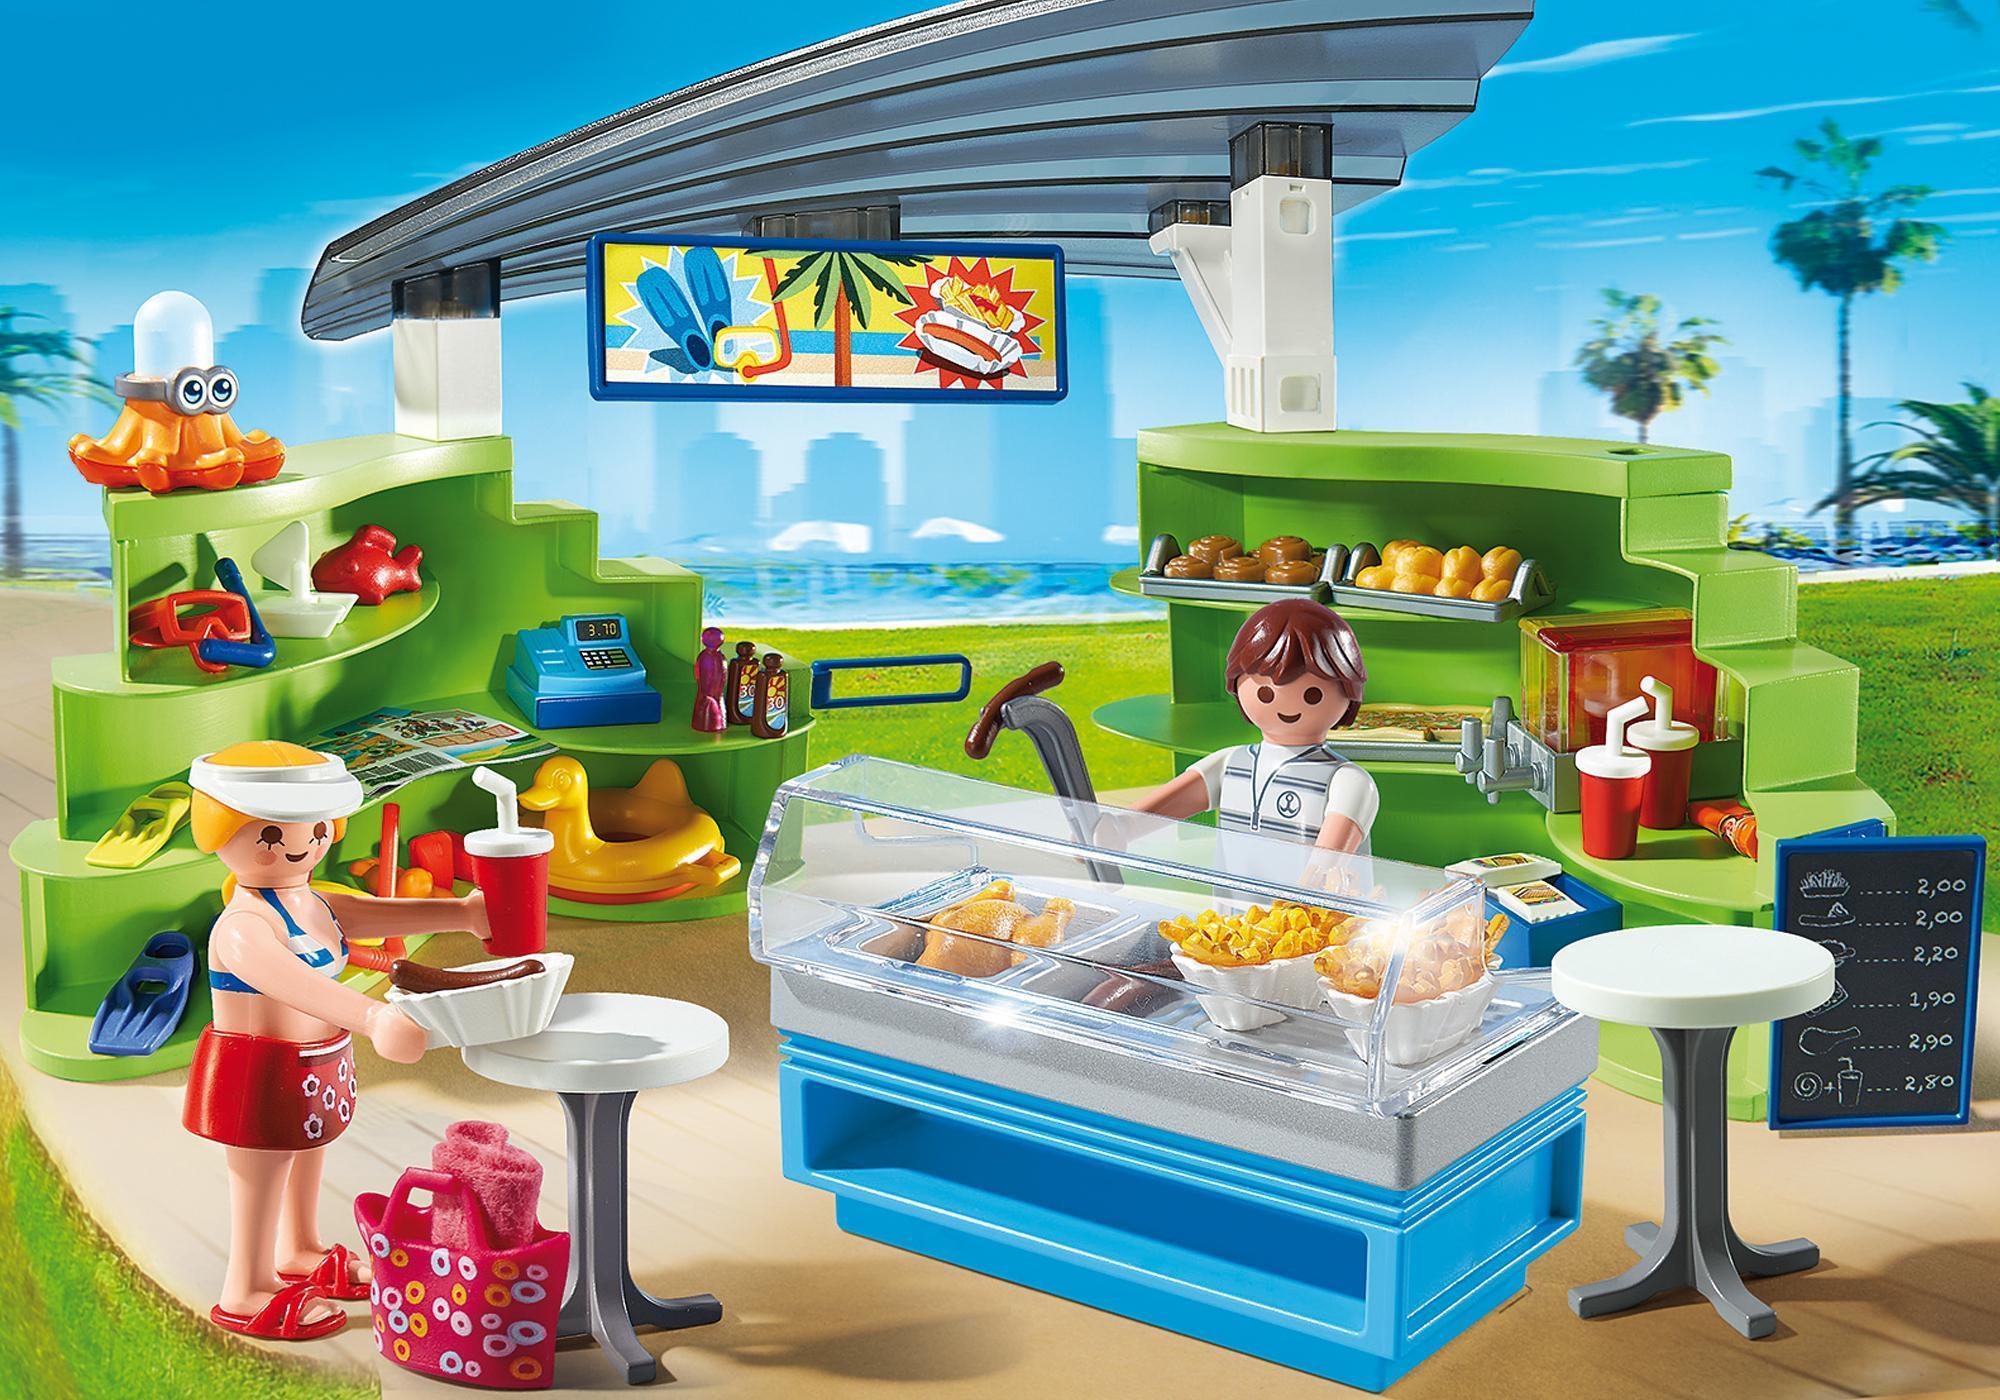 http://media.playmobil.com/i/playmobil/6672_product_detail/Winkel met snackbar